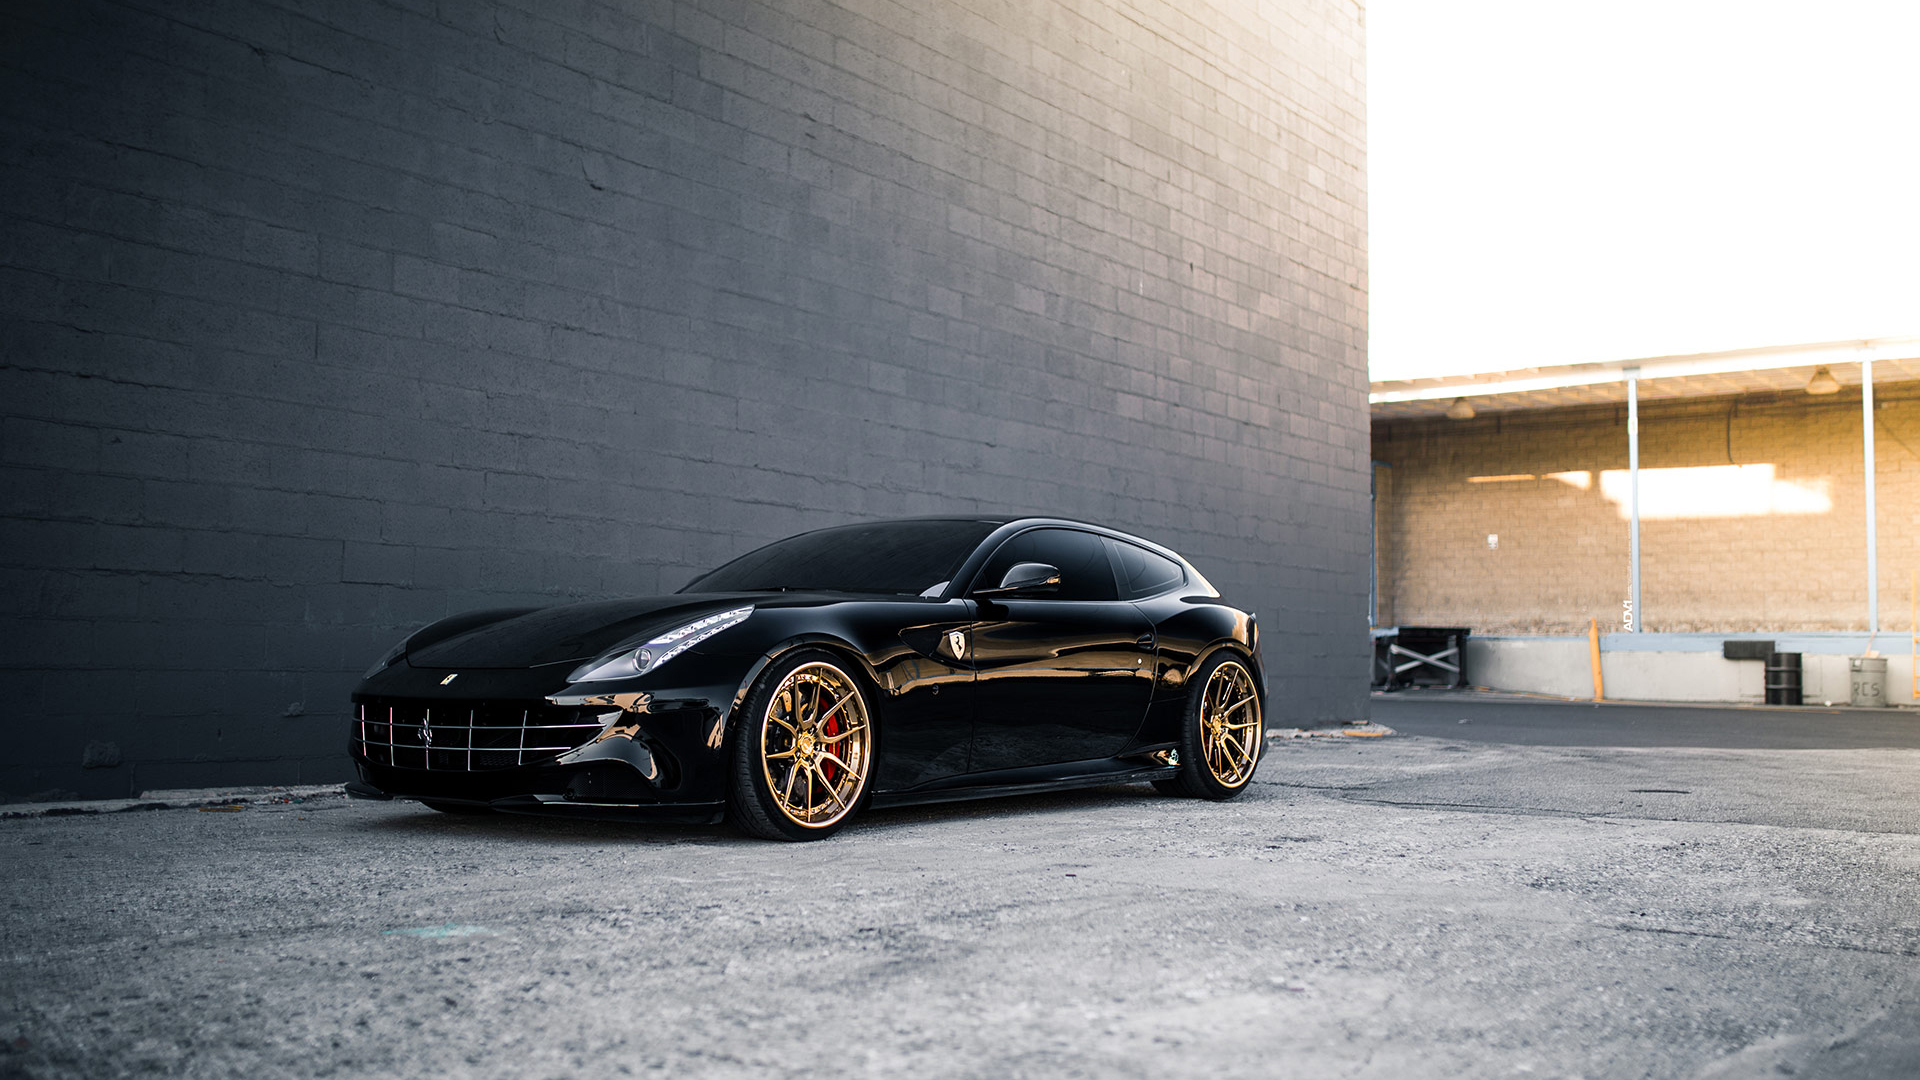 Black Ferrari FF 2 Wallpaper | HD Car Wallpapers | ID #10943